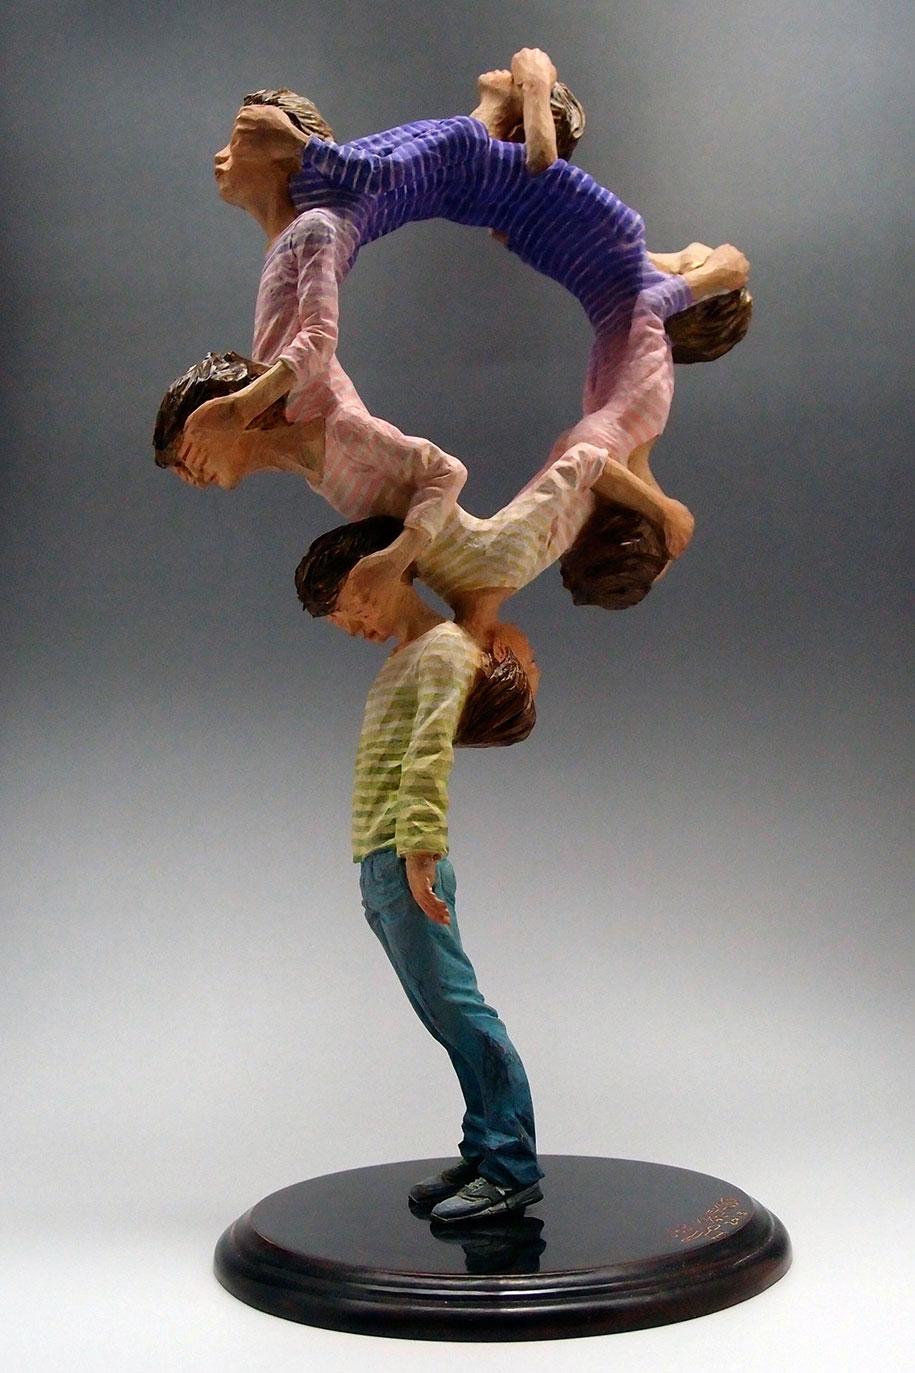 surreal-wooden-sculptures-yoshitoshi-kanemaki-11